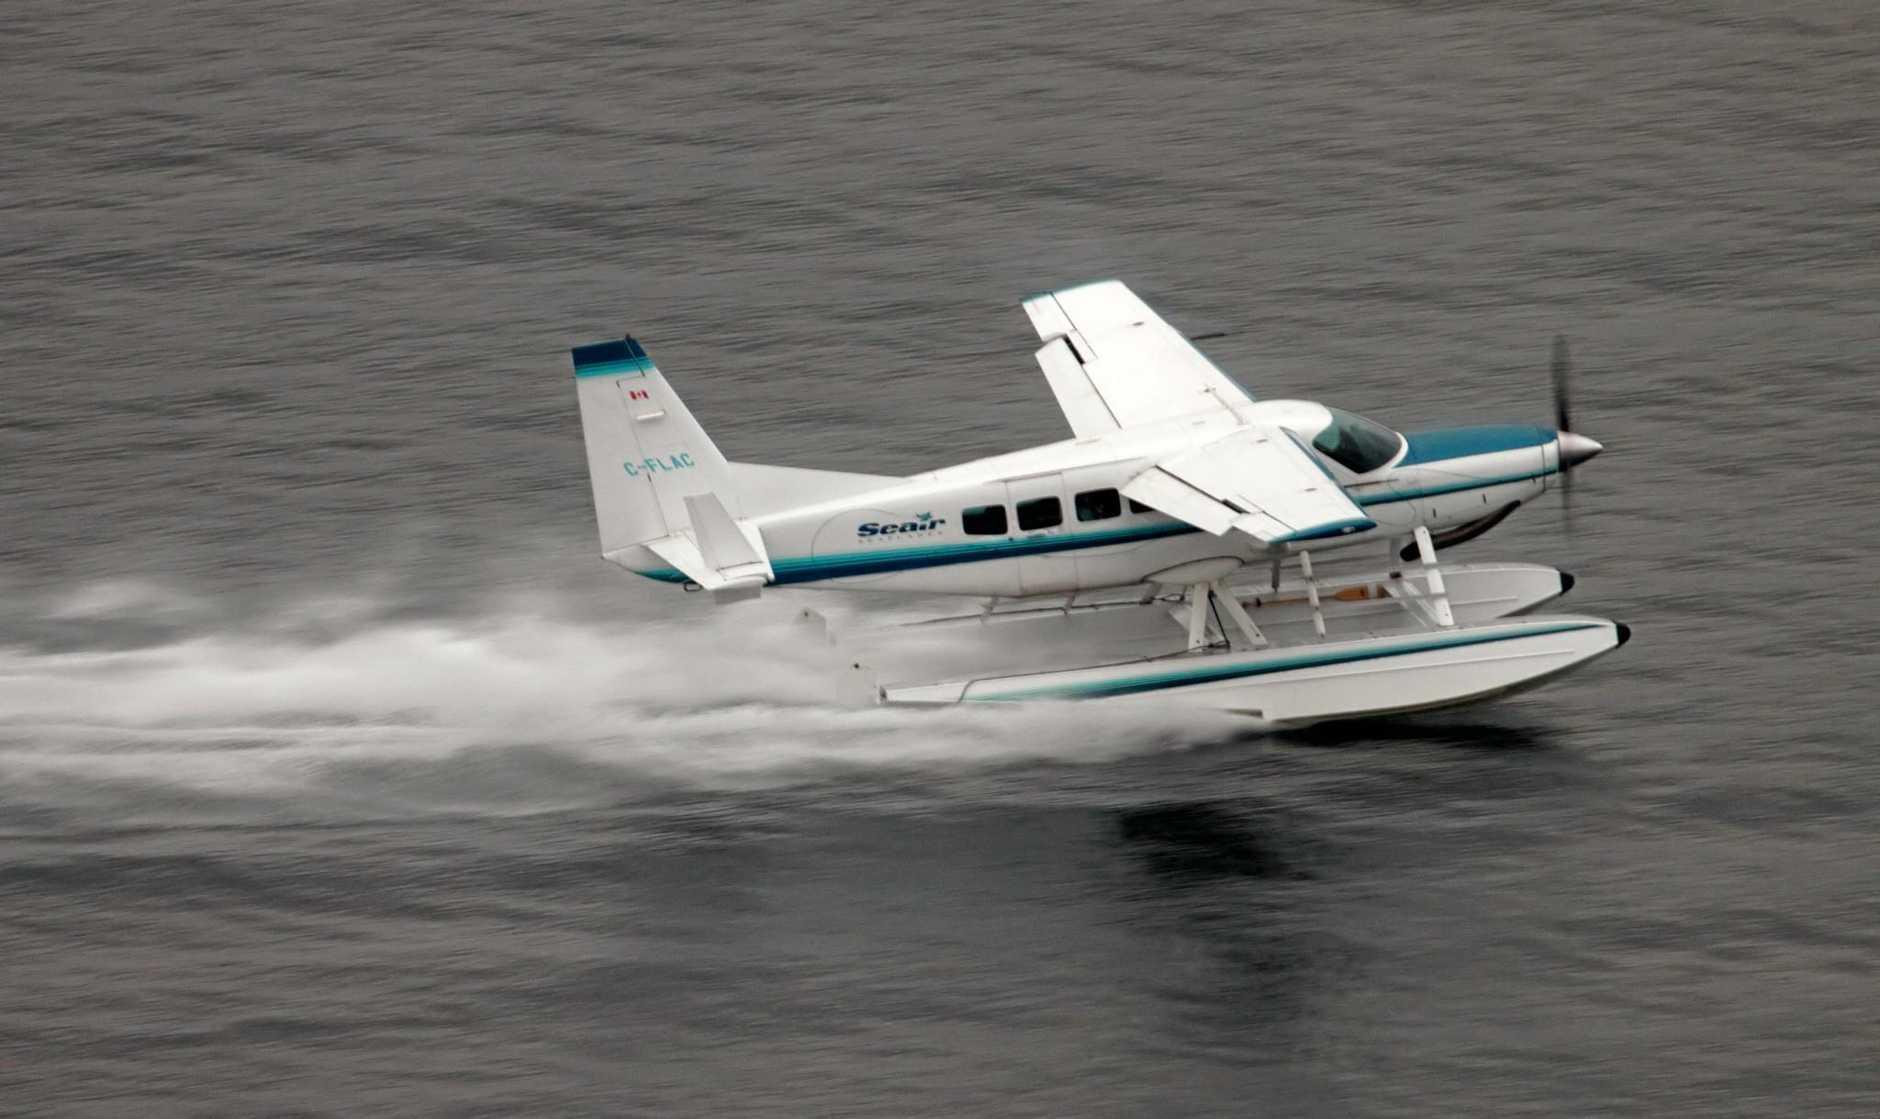 A Cessna 208 Seaplane, similar to the plane which crashed on Hamilton Island.